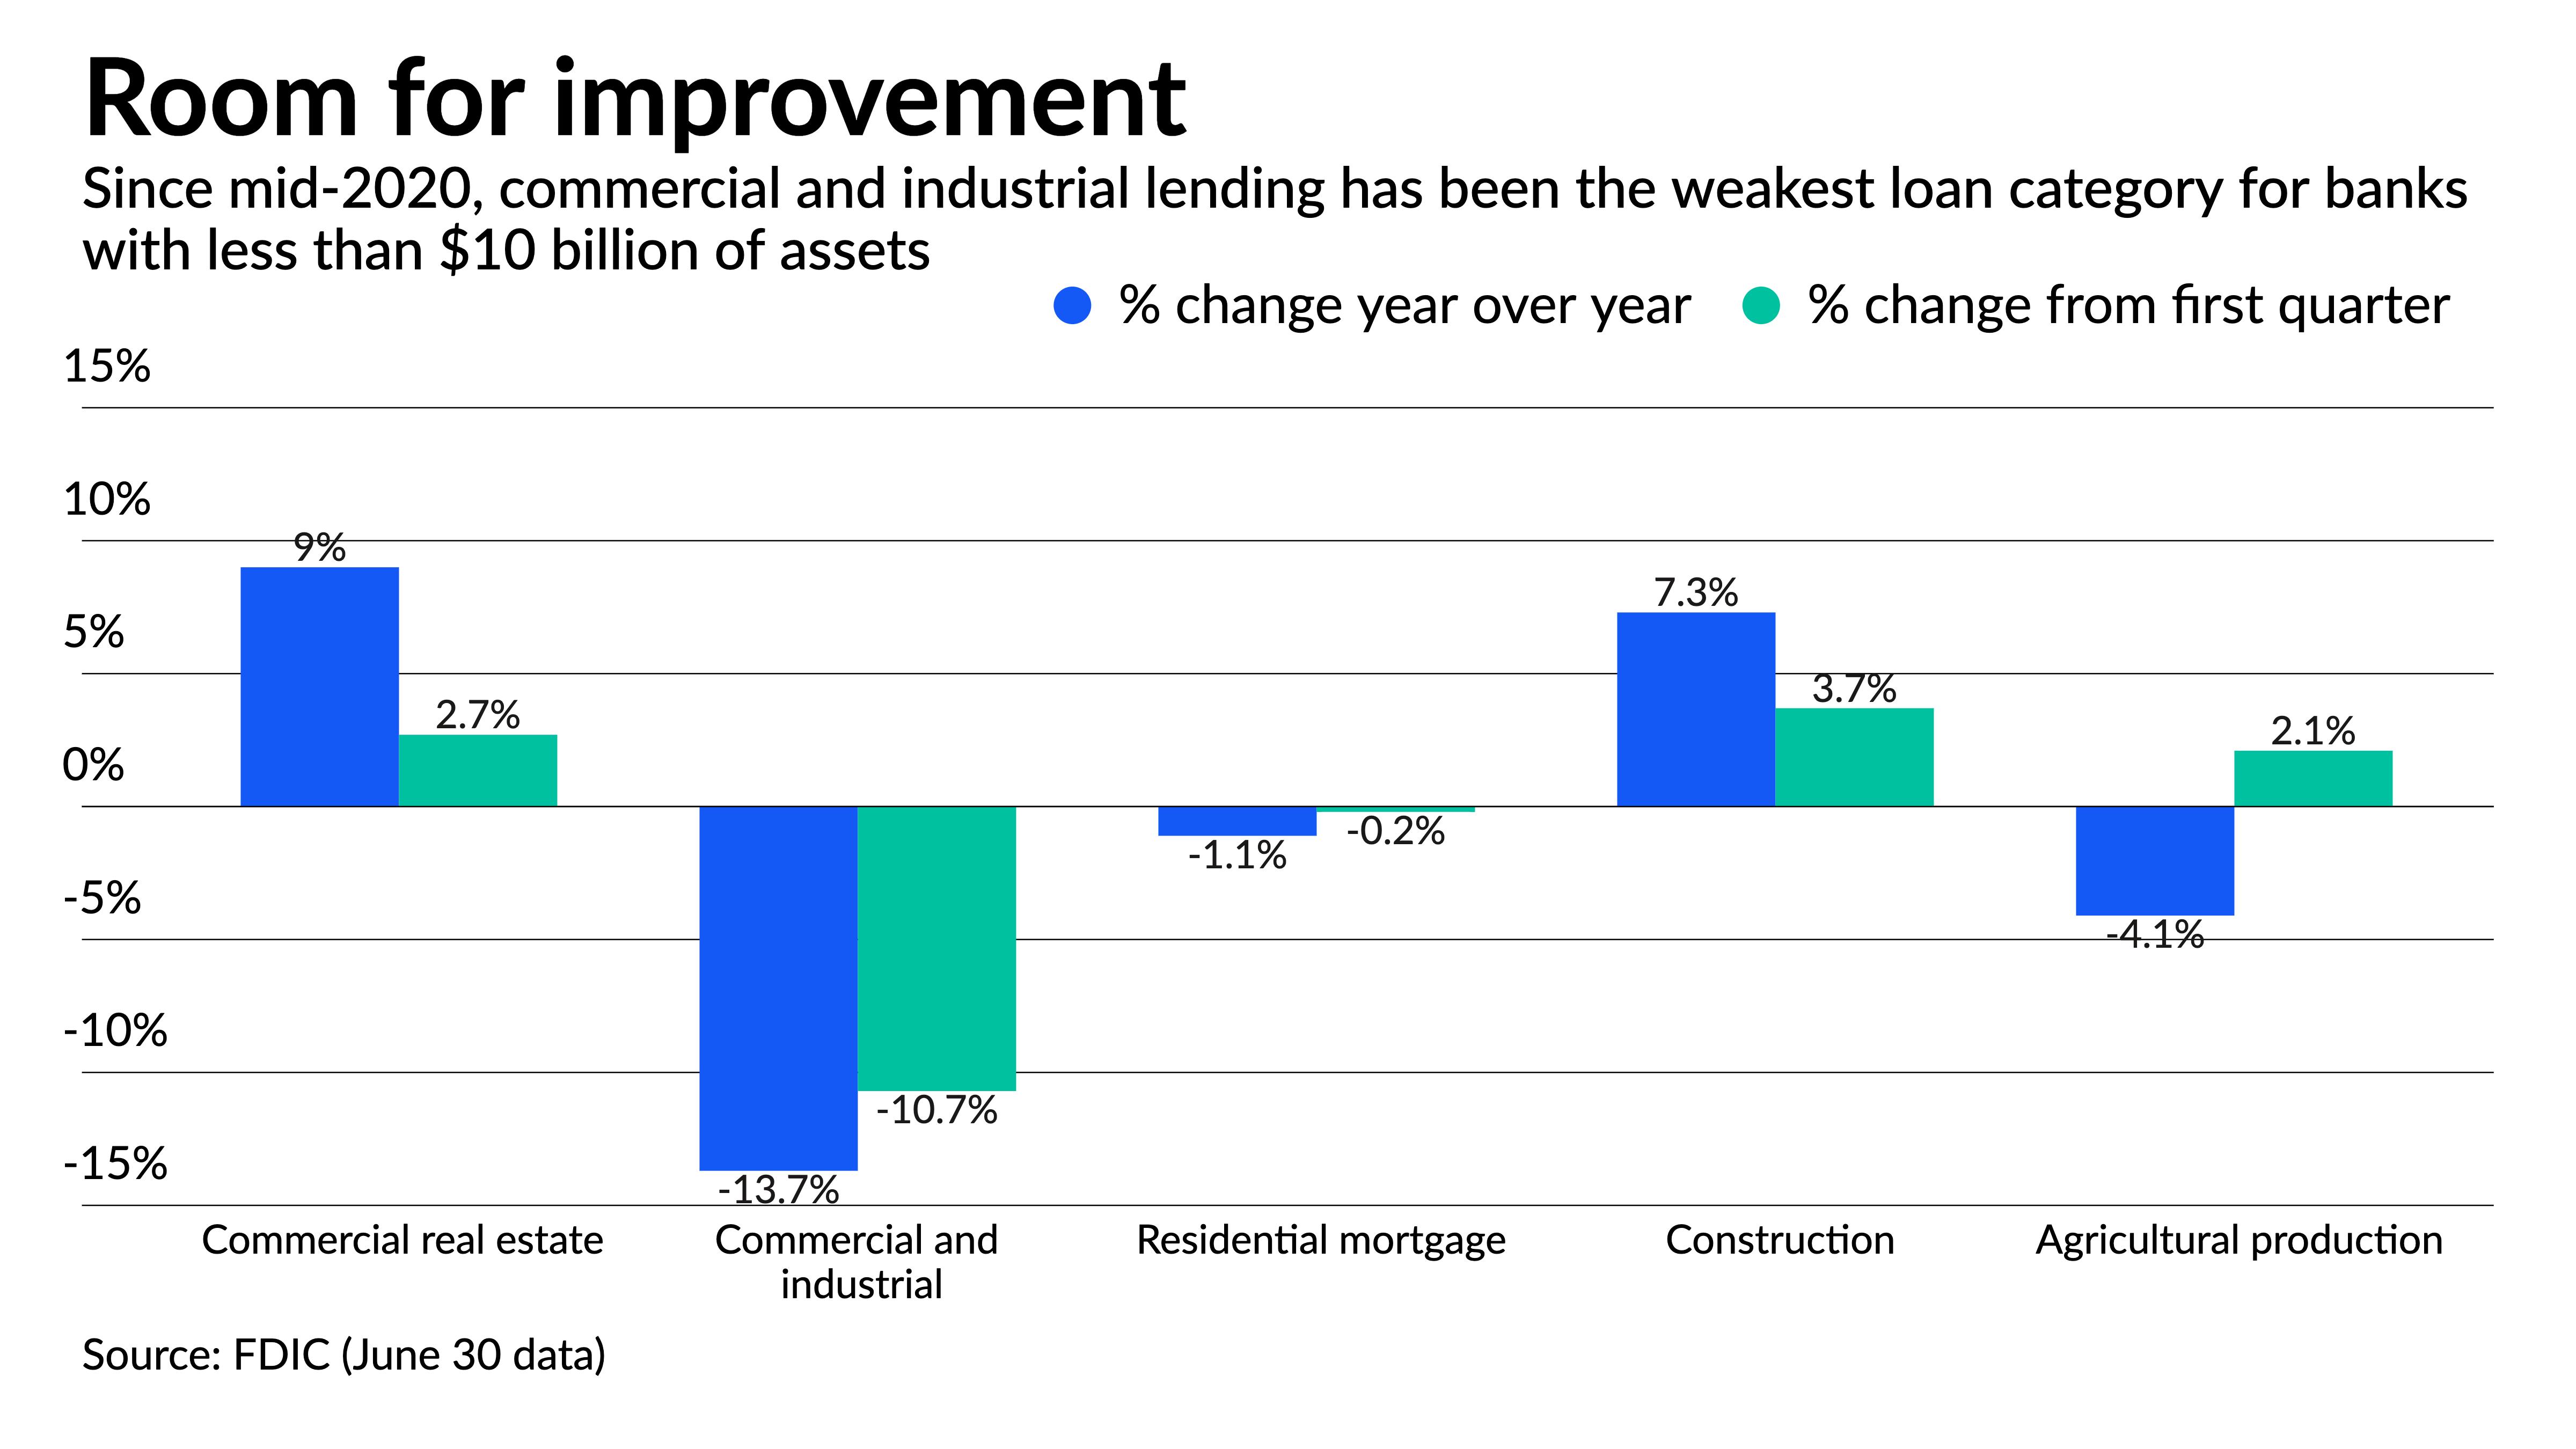 americanbanker.com - Jim Dobbs - Small banks turn corner on loan growth